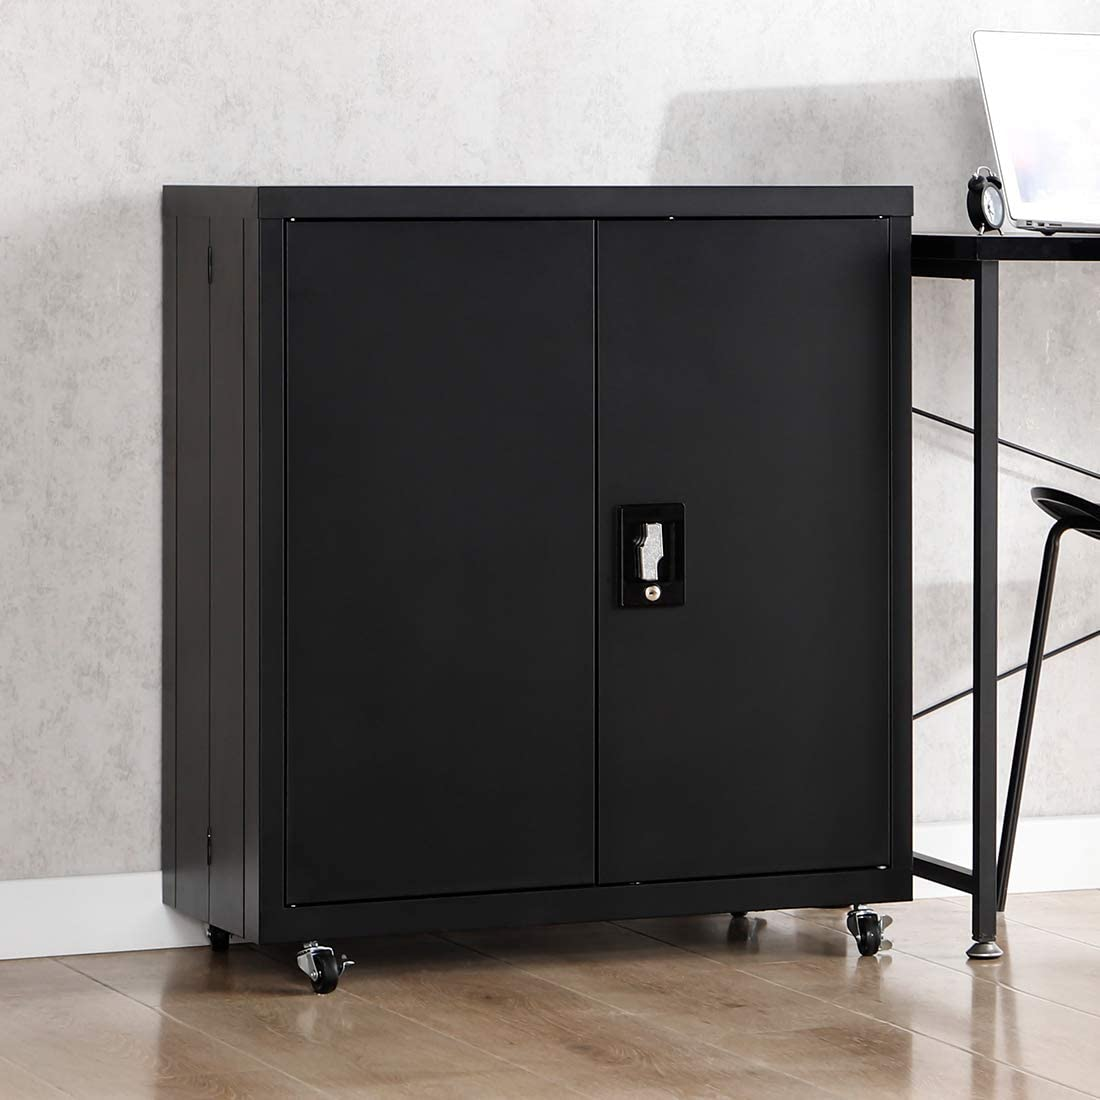 GREATMEET Gauge 24 Metal Cabinet Locking Half Height Steel Counter Cabinet